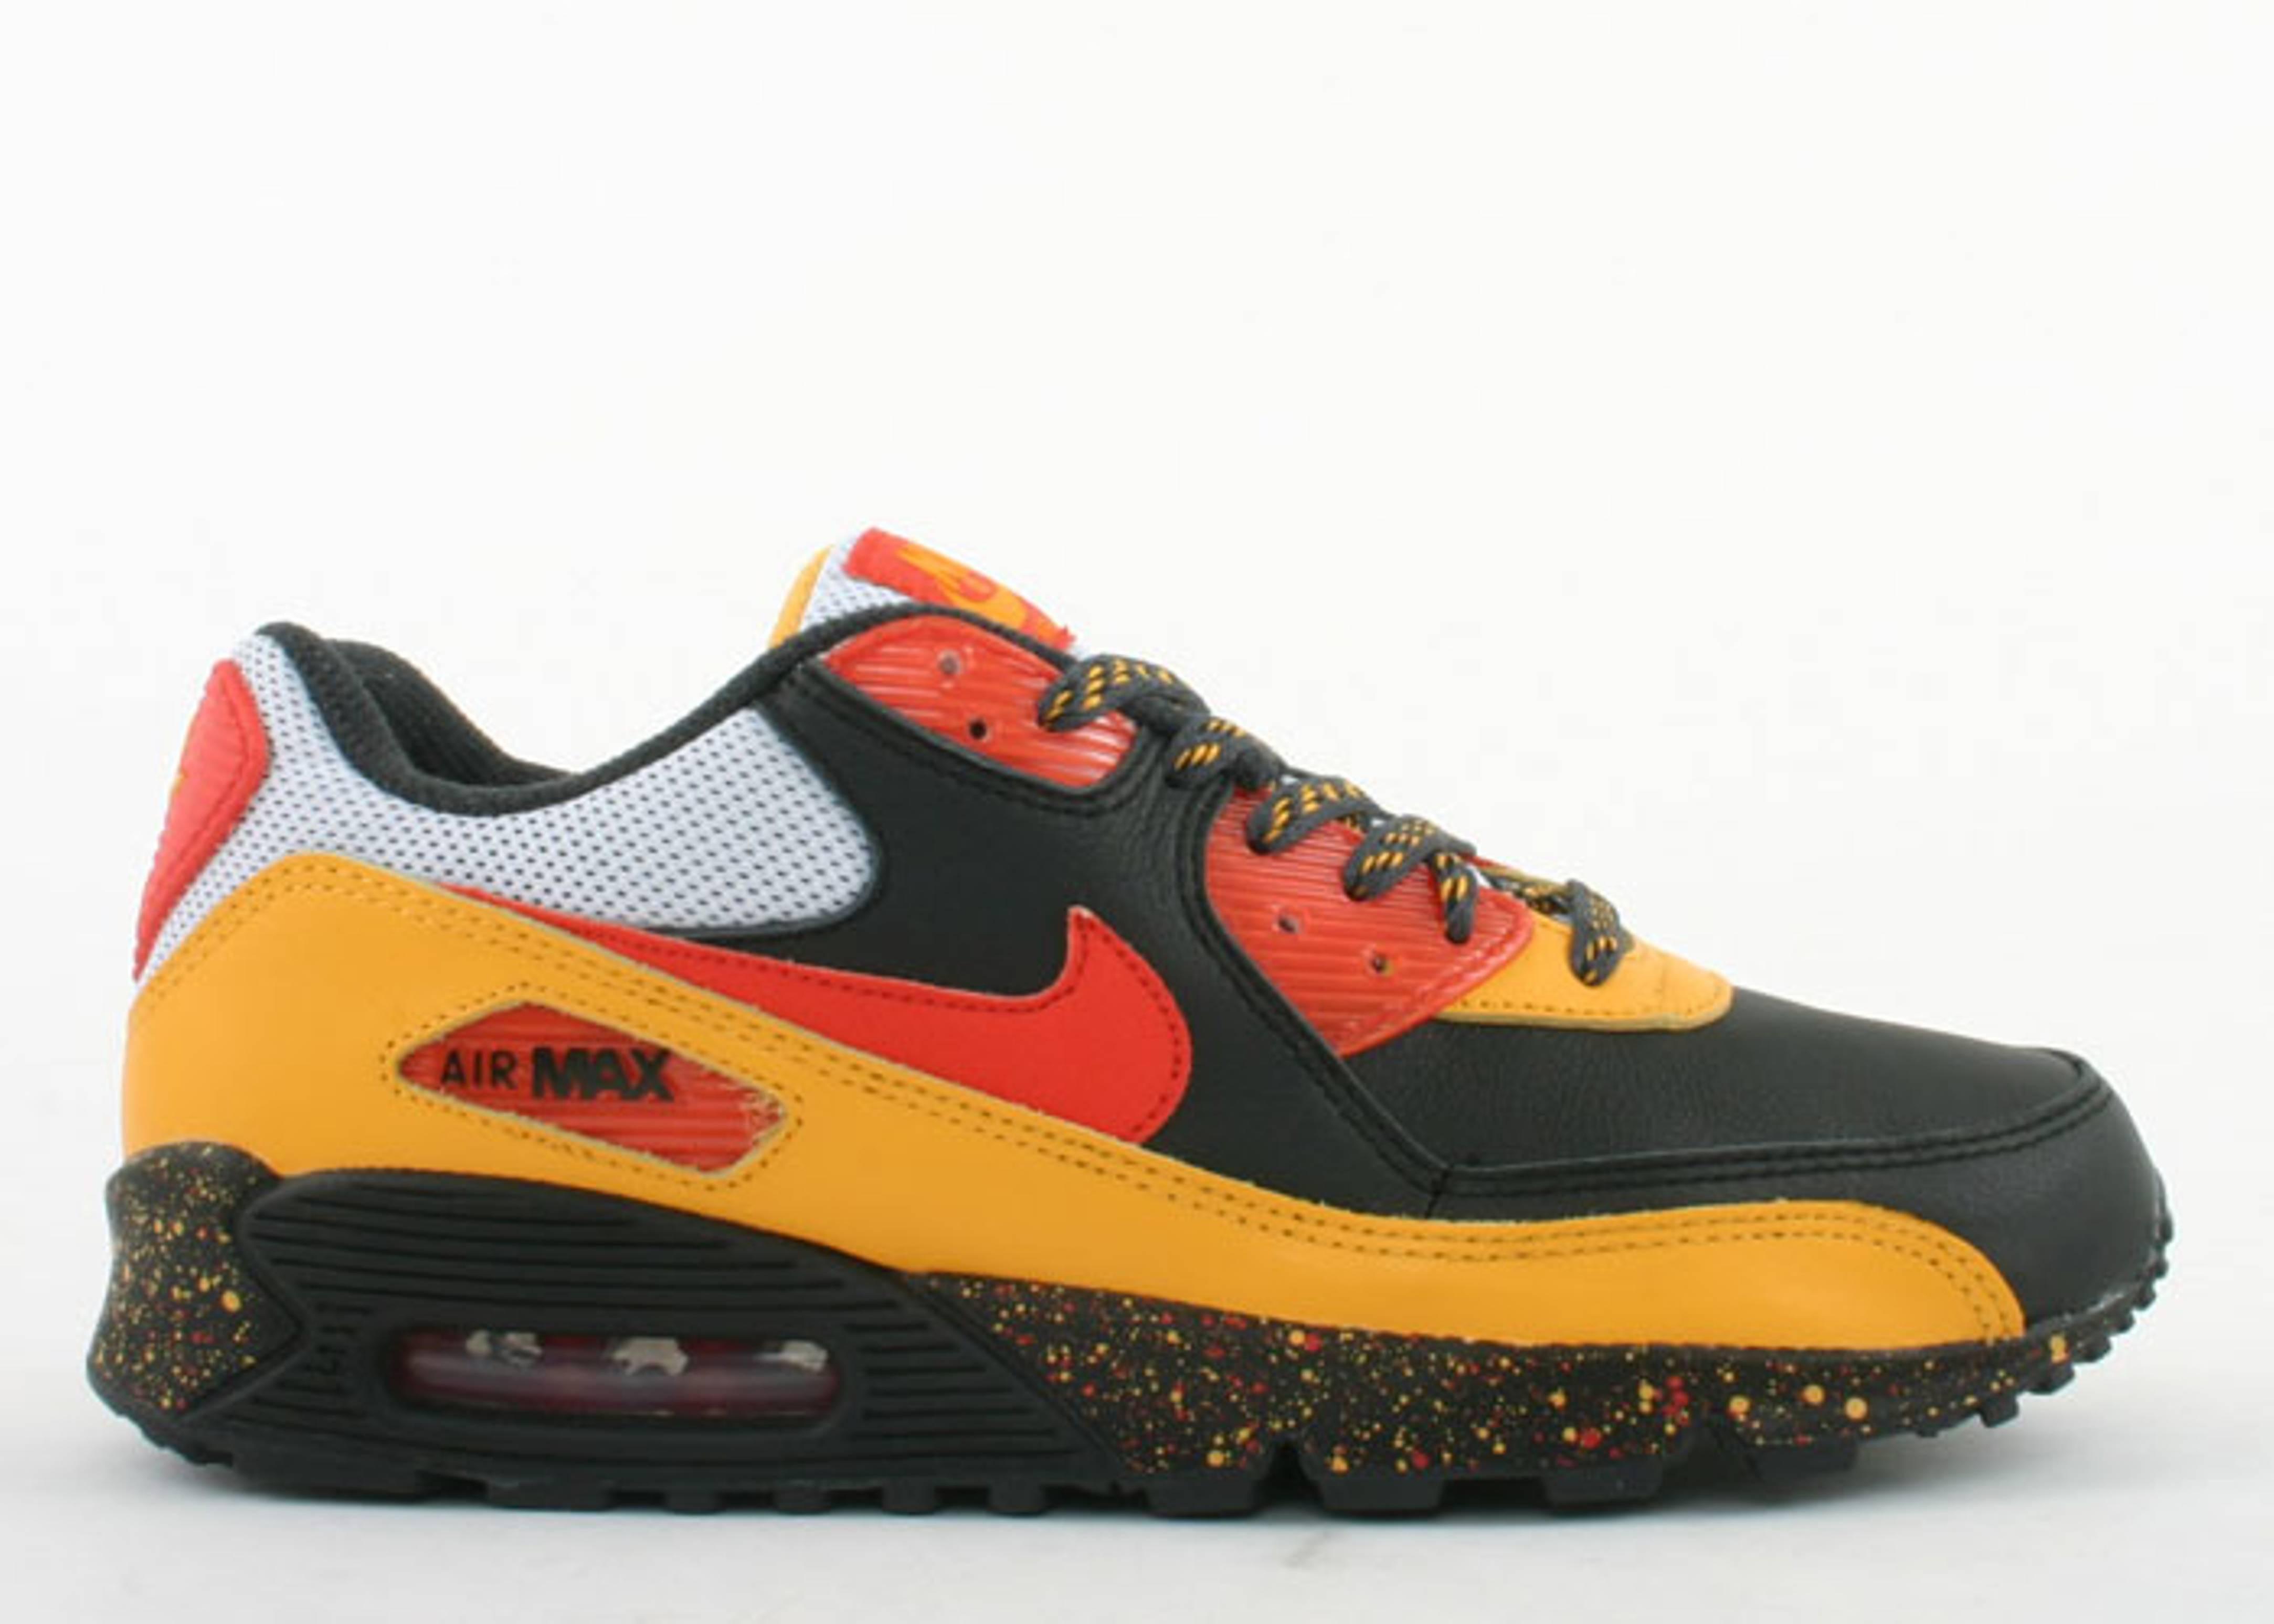 watch 5c1c7 dea00 ... yellow black shoes,nike football shoes price Air Max 90 Premium ...